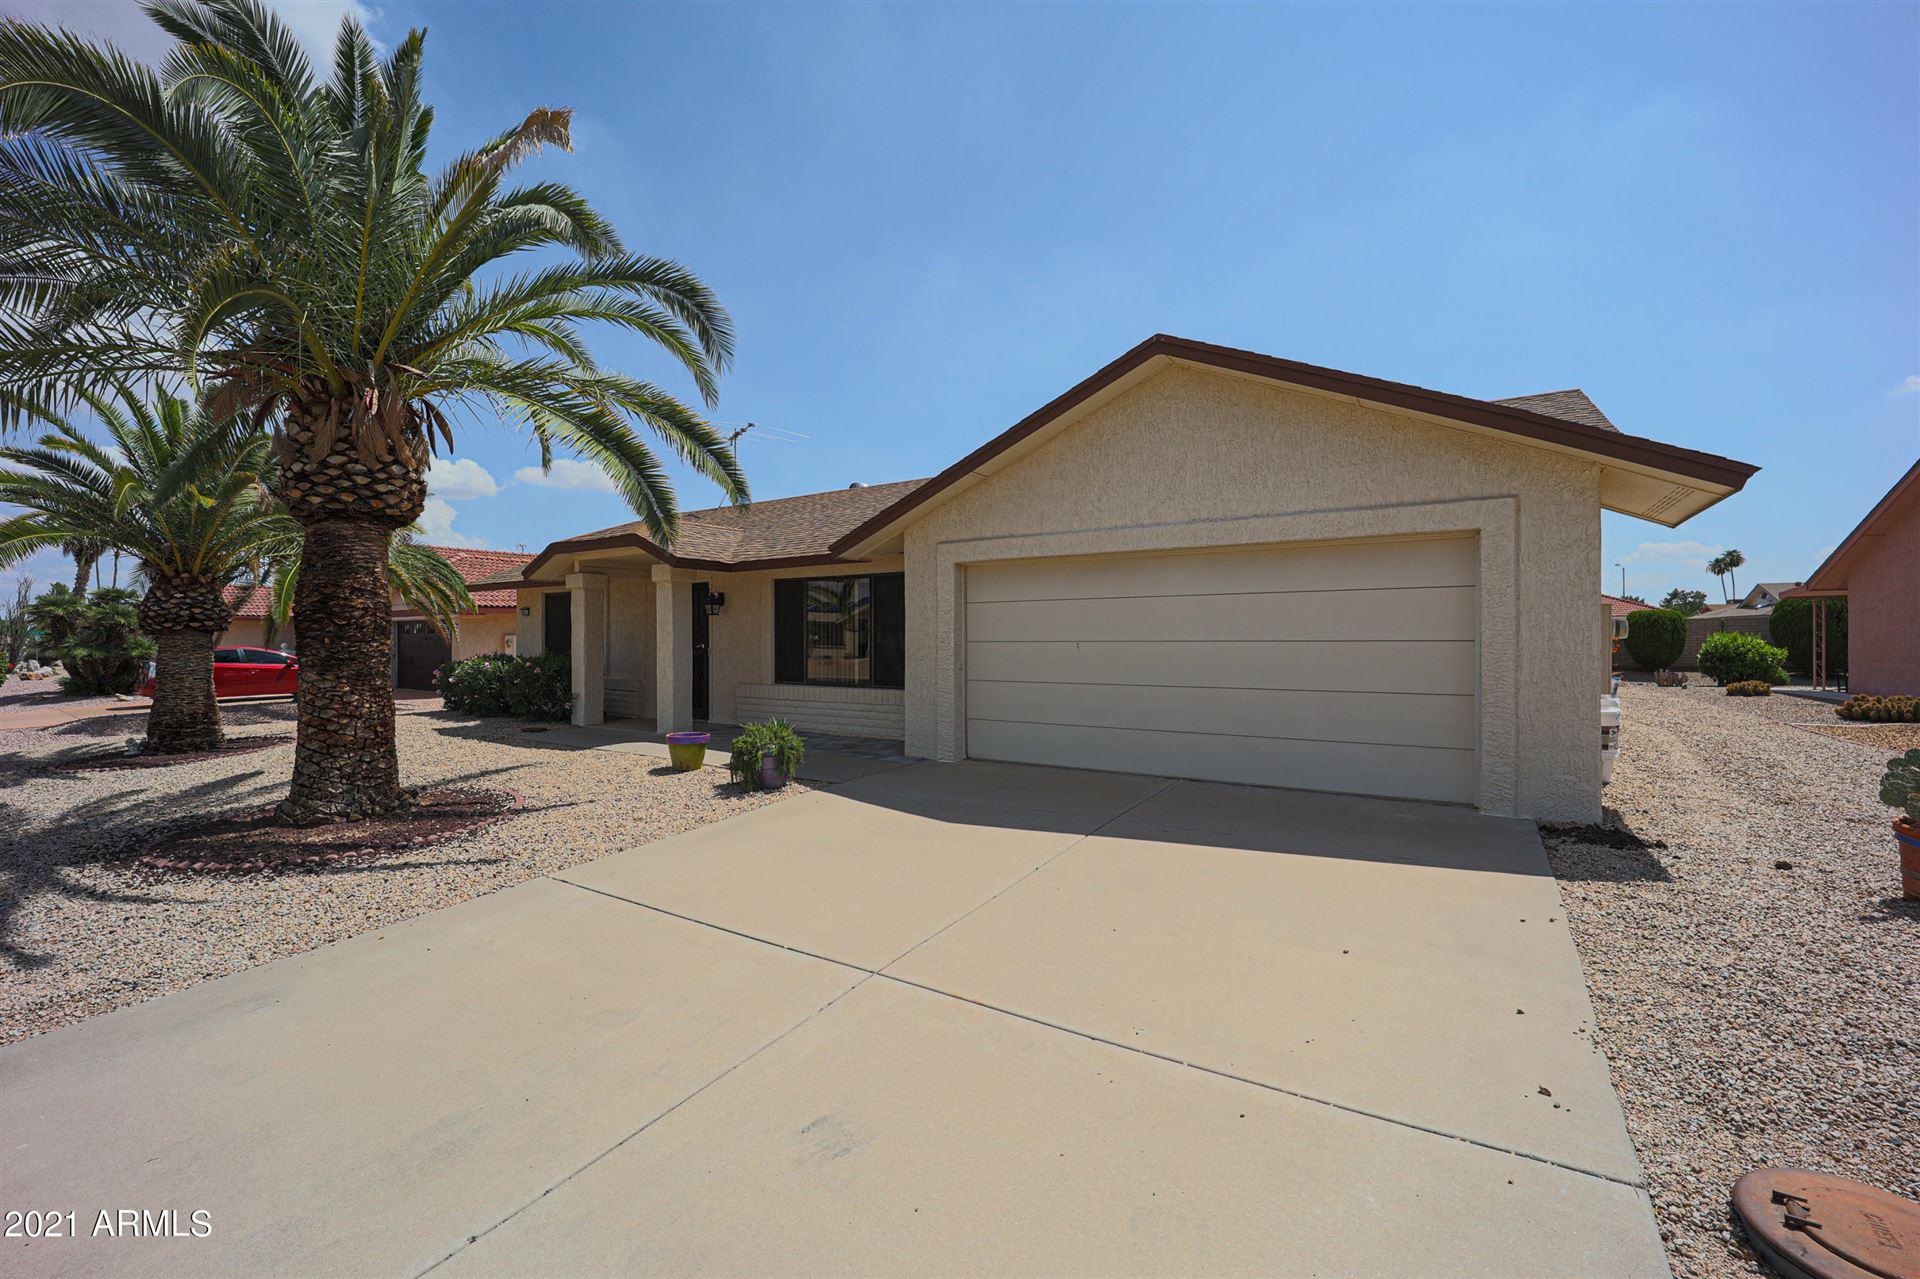 Photo of 14511 W YOSEMITE Drive, Sun City West, AZ 85375 (MLS # 6272488)